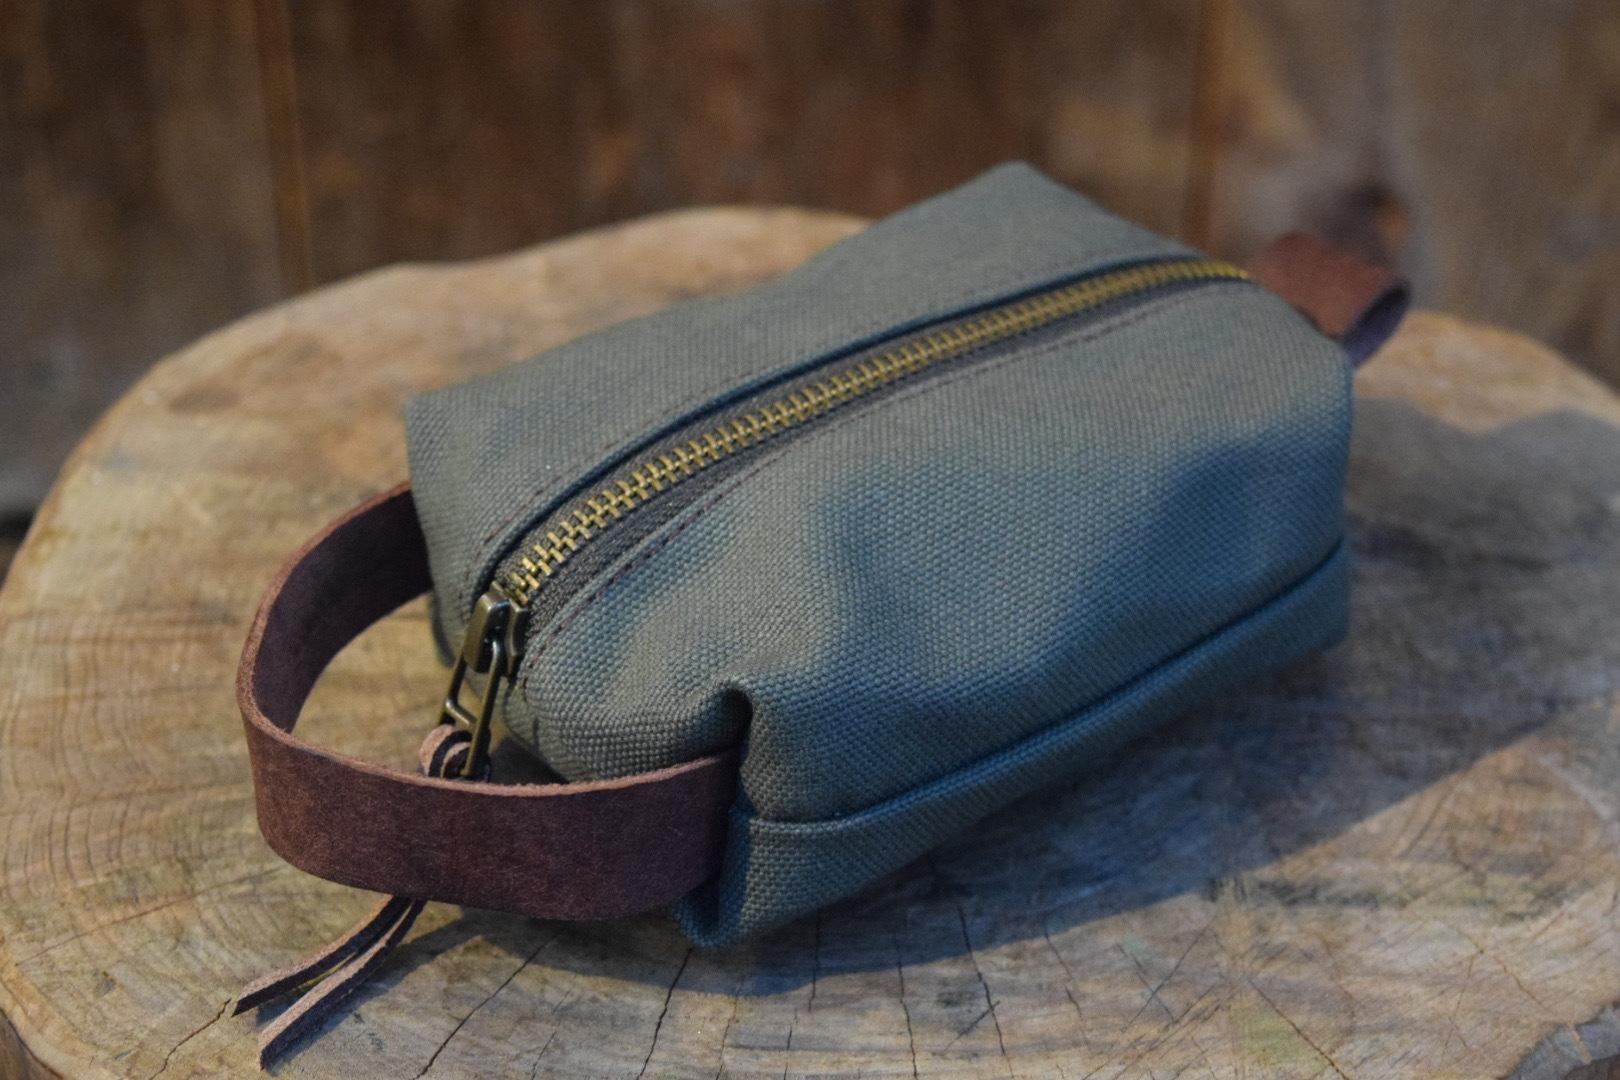 新品 Original Heavyduty pouch GREEN -Small G06